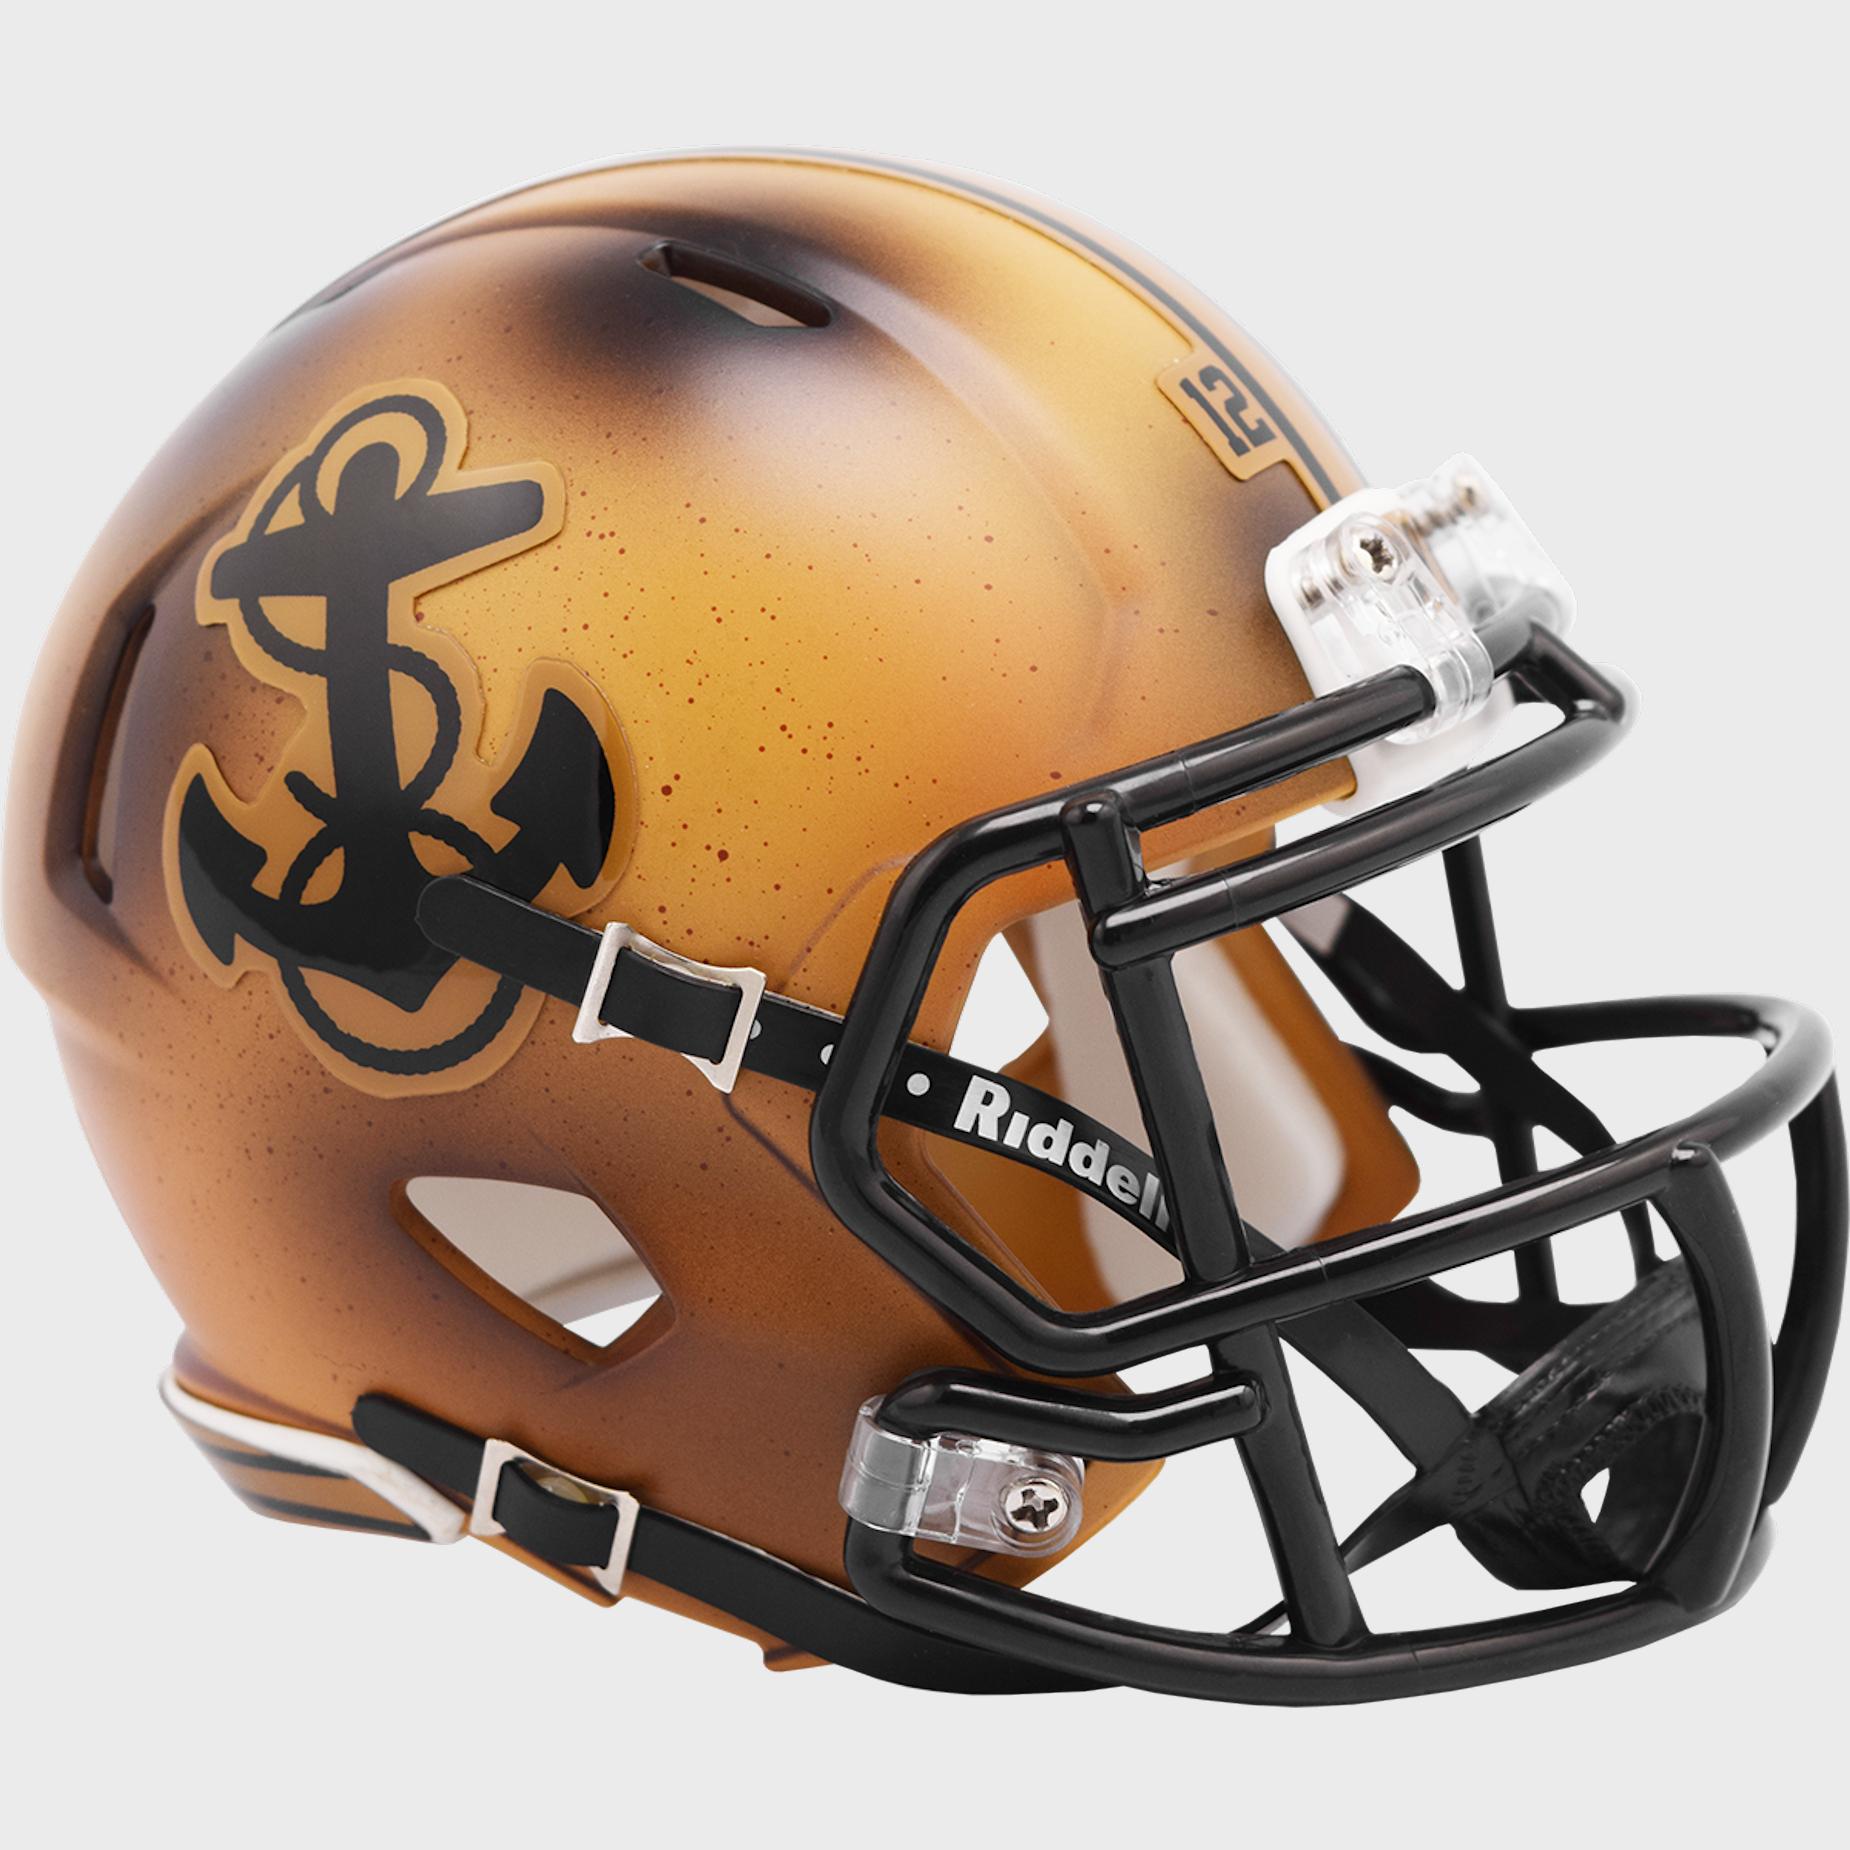 Navy Midshipmen NCAA Mini Speed Football Helmet <B>2019 Bowl Limited Edition</B>